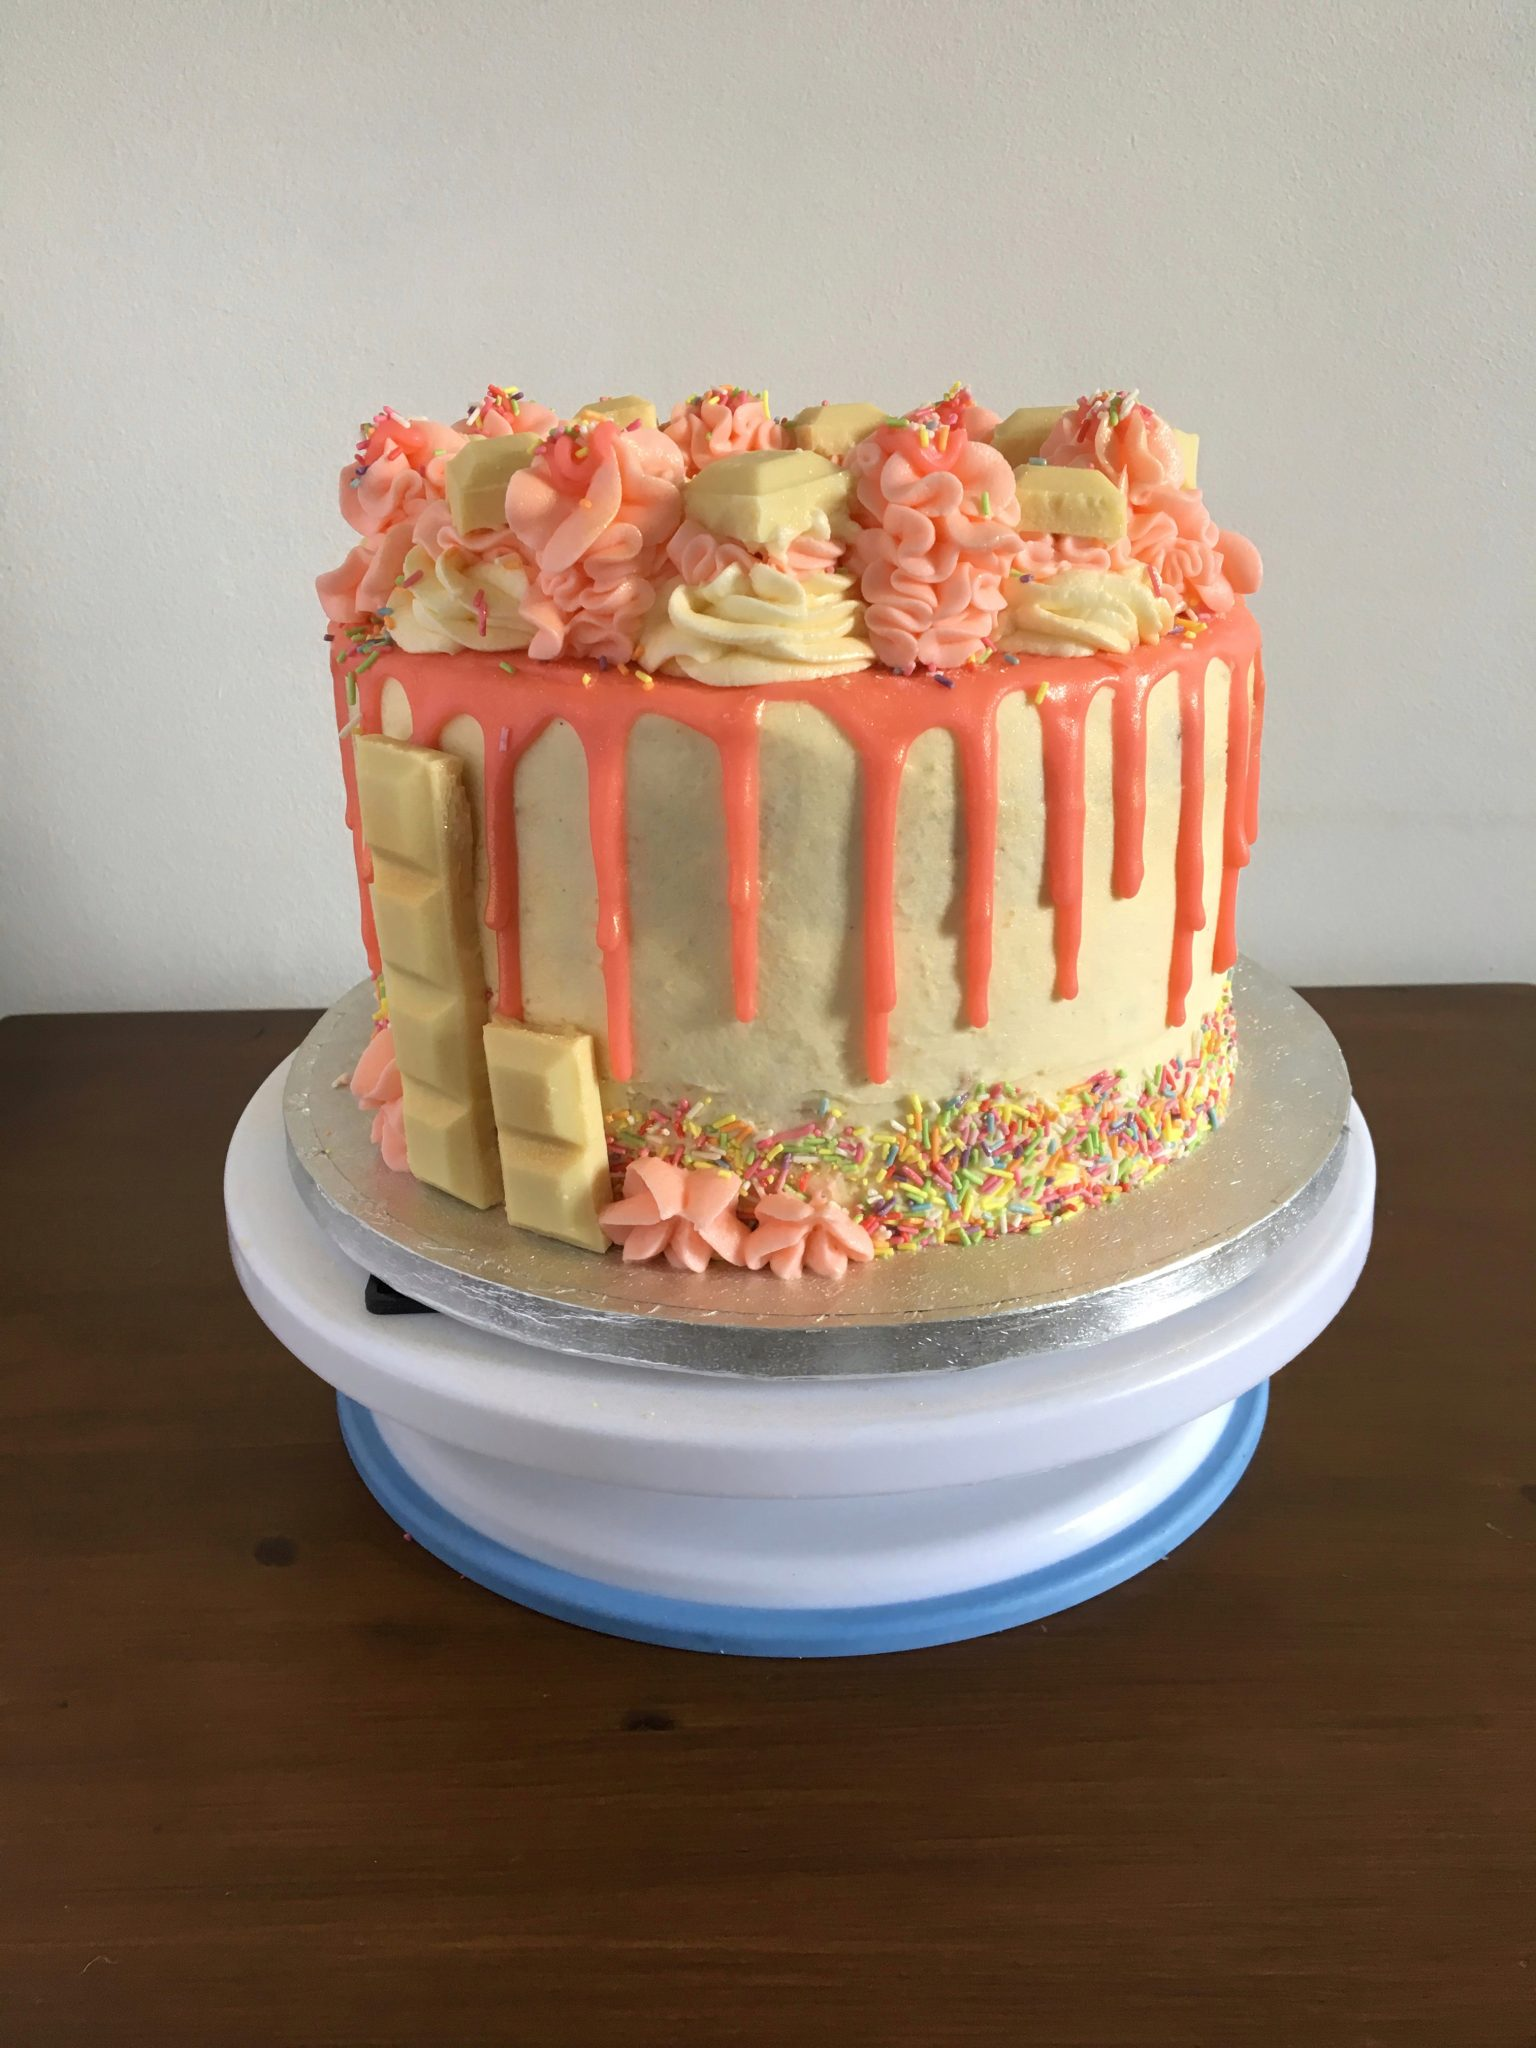 Enquire For Celebration Cakes